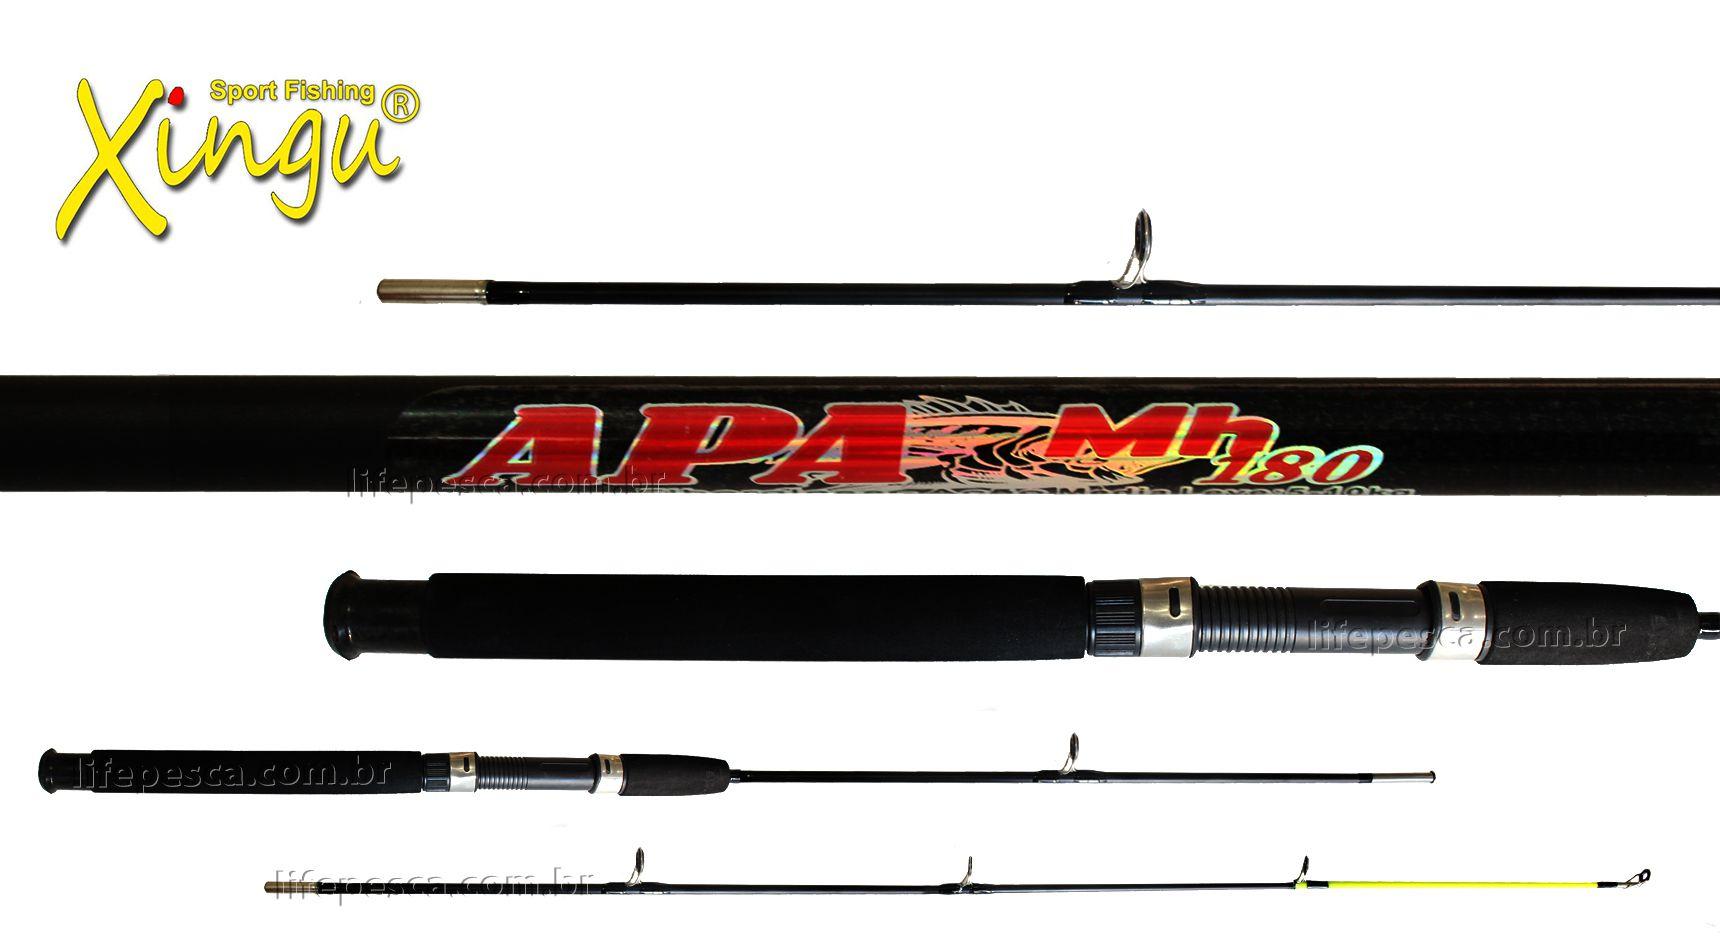 Vara para Molinete Xingu APA MH 8 0 (2,40m) 15-30Lbs XV3171 - 2 Partes - Várias Cores